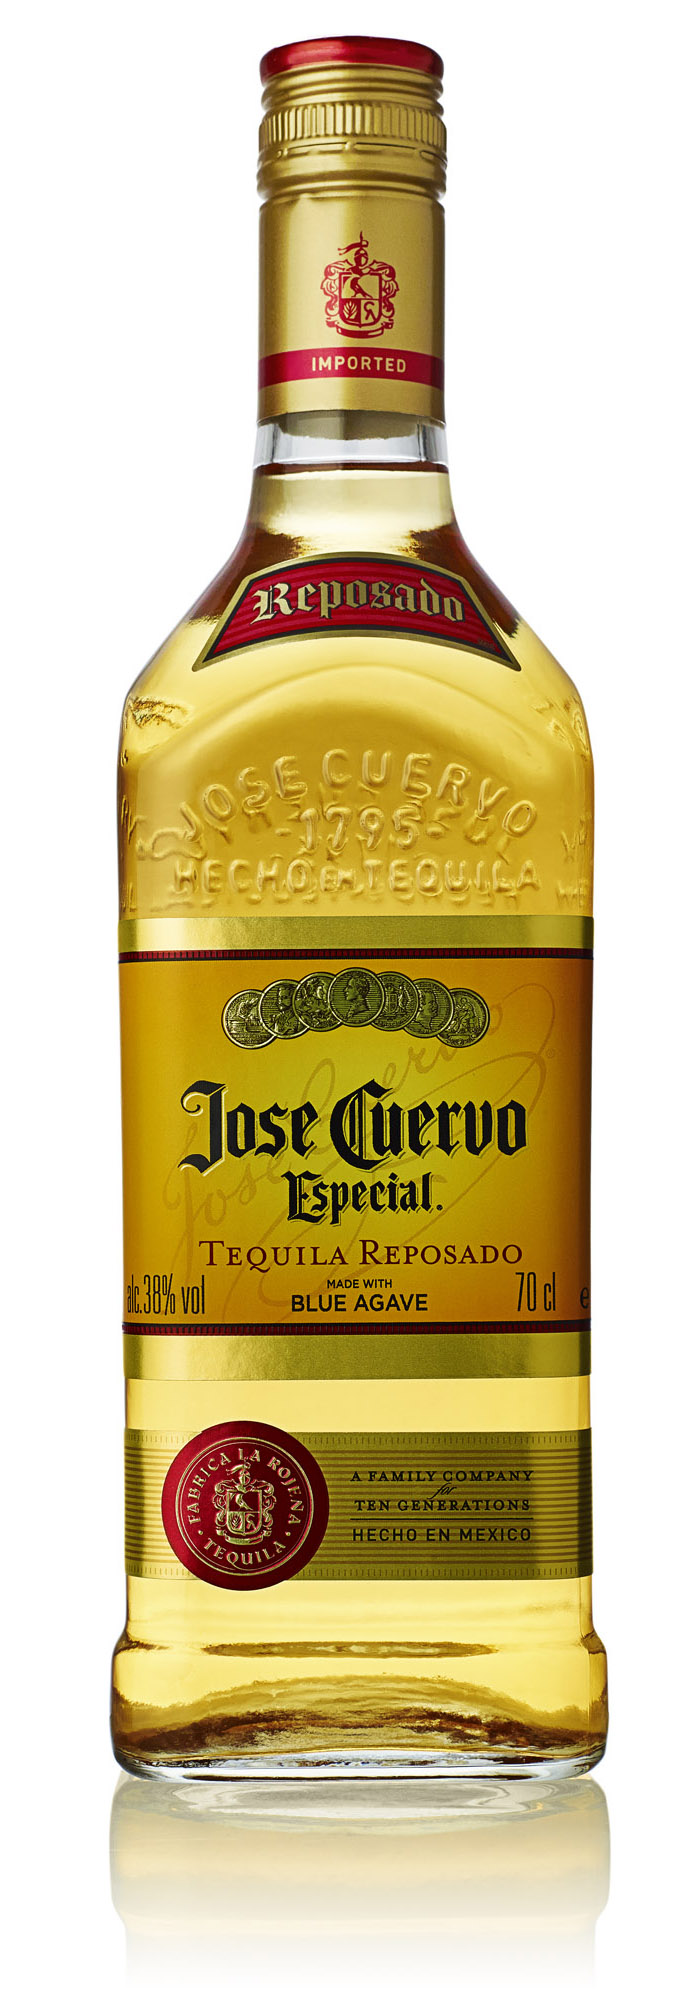 Jose_Cuervo_Reposado_Especial_2